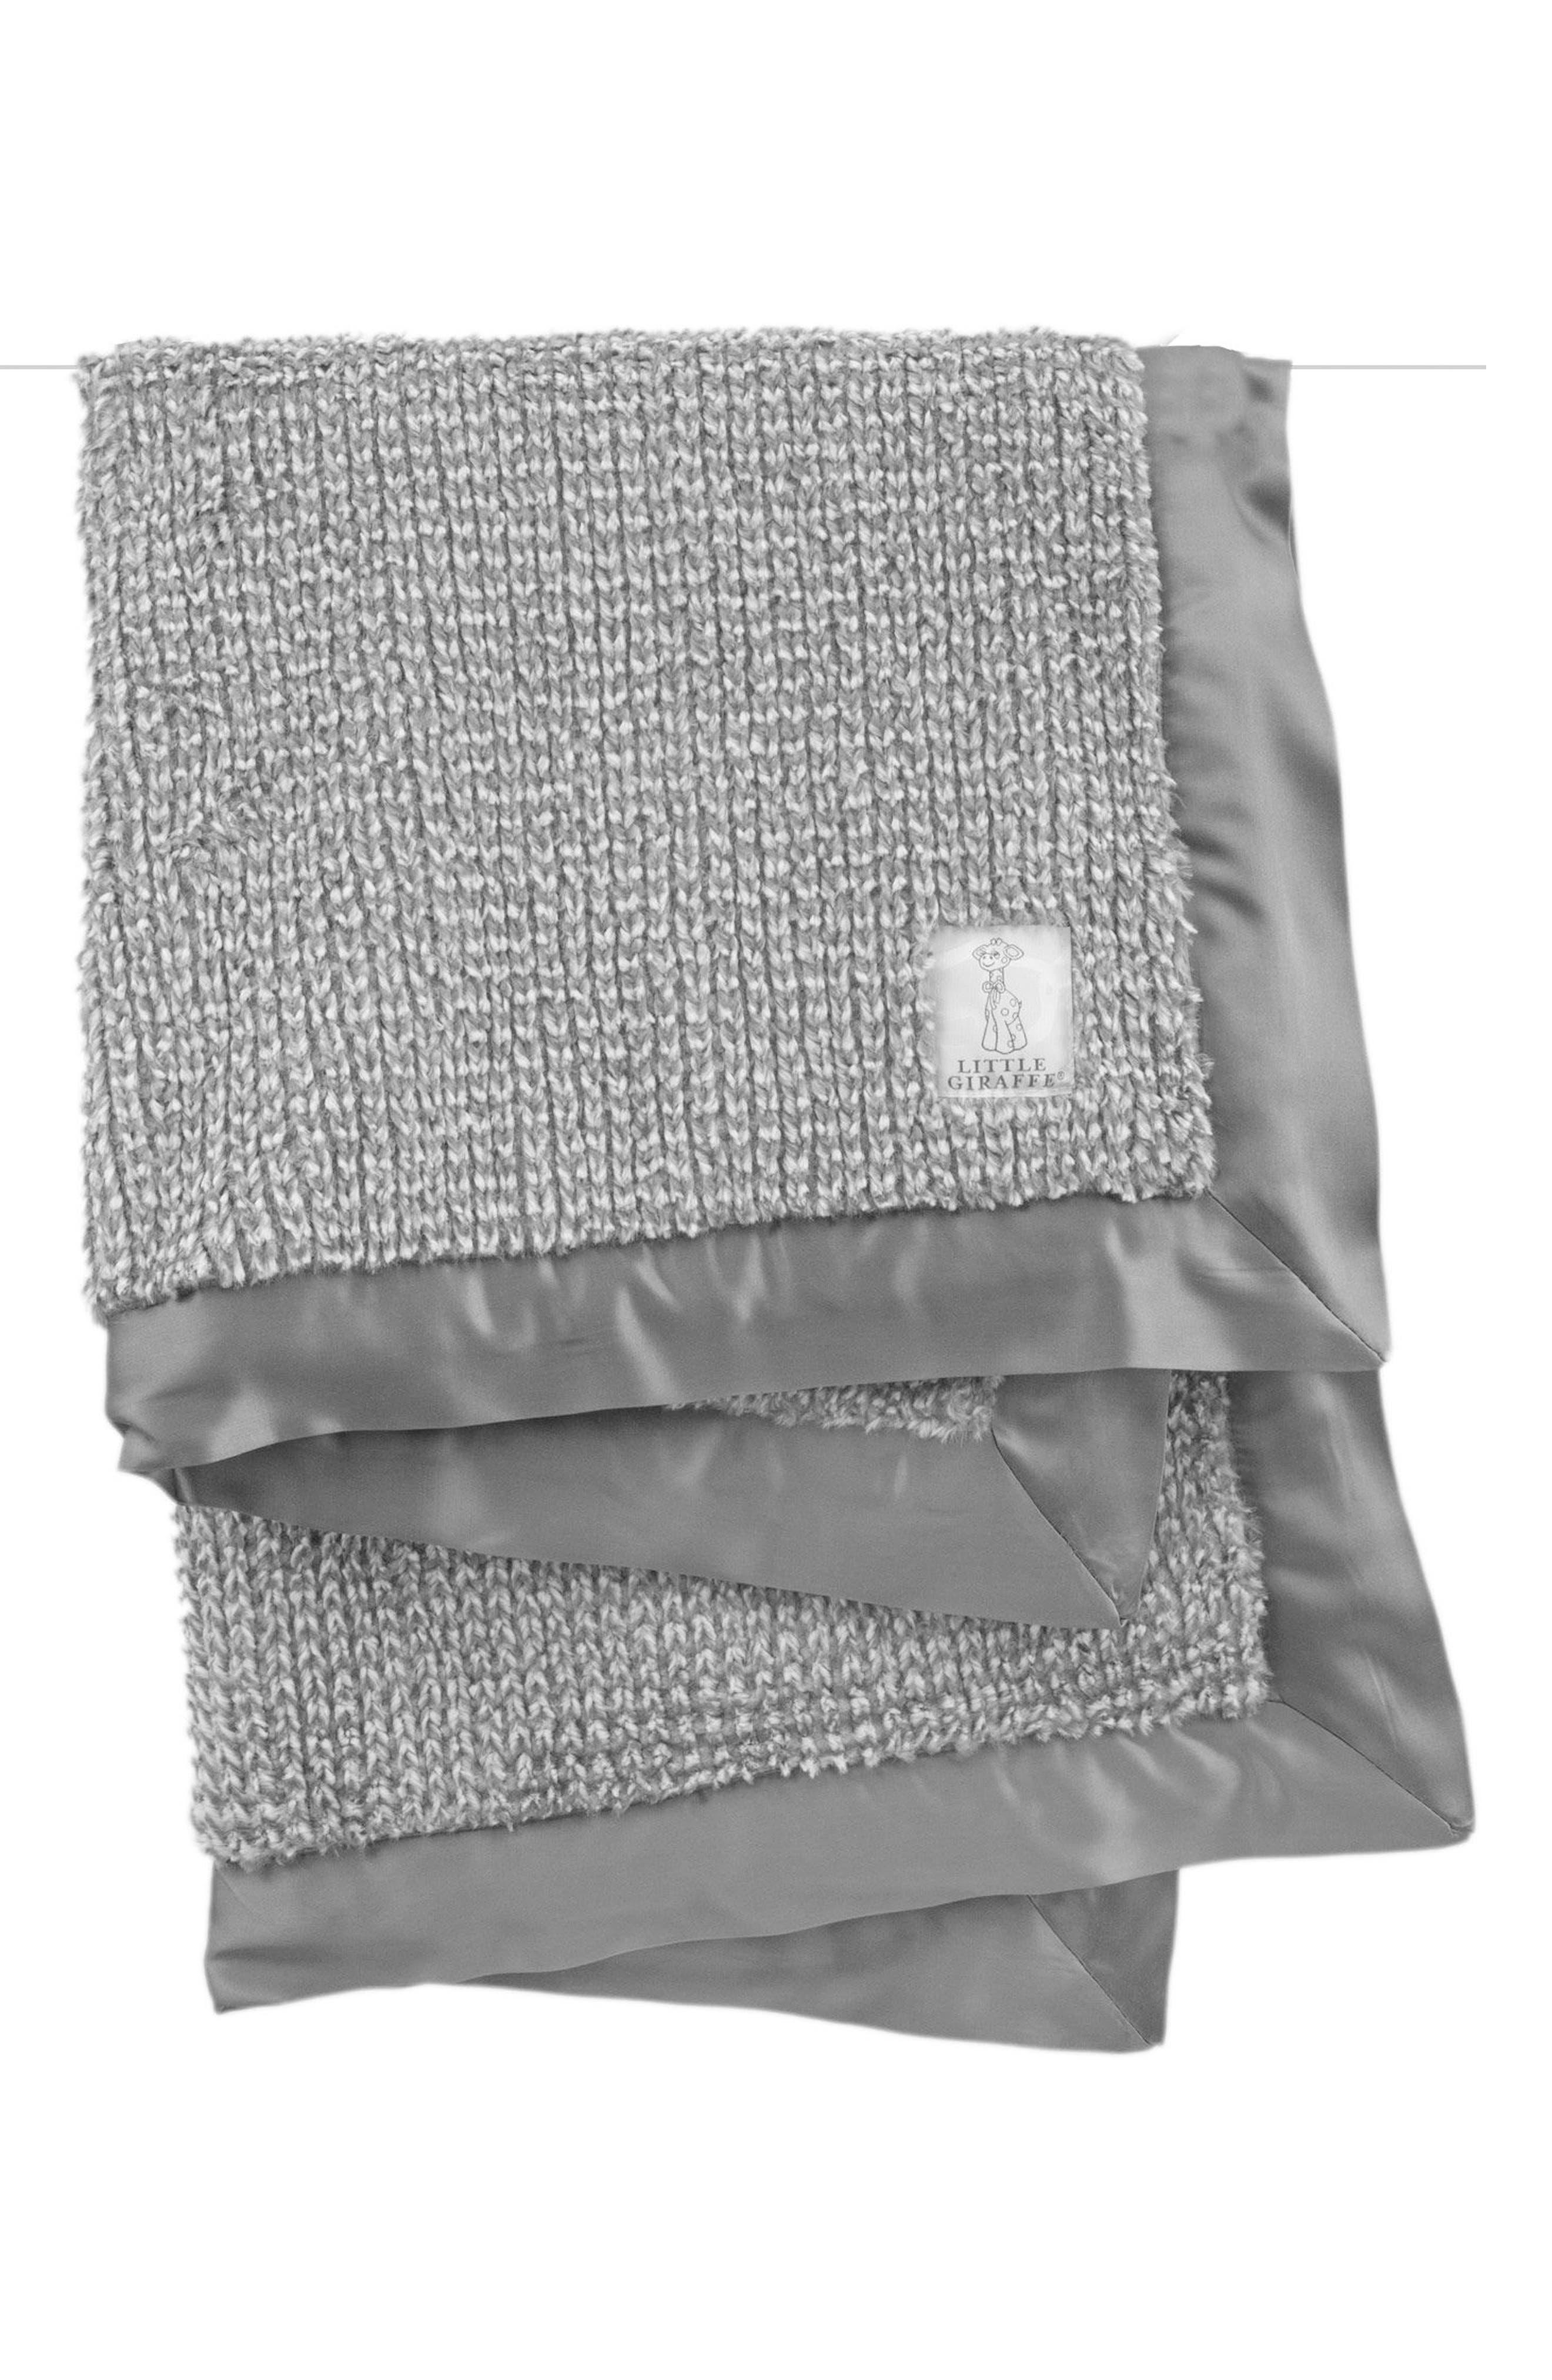 Luxe Herringbone Blanket,                             Main thumbnail 1, color,                             CHARCOAL